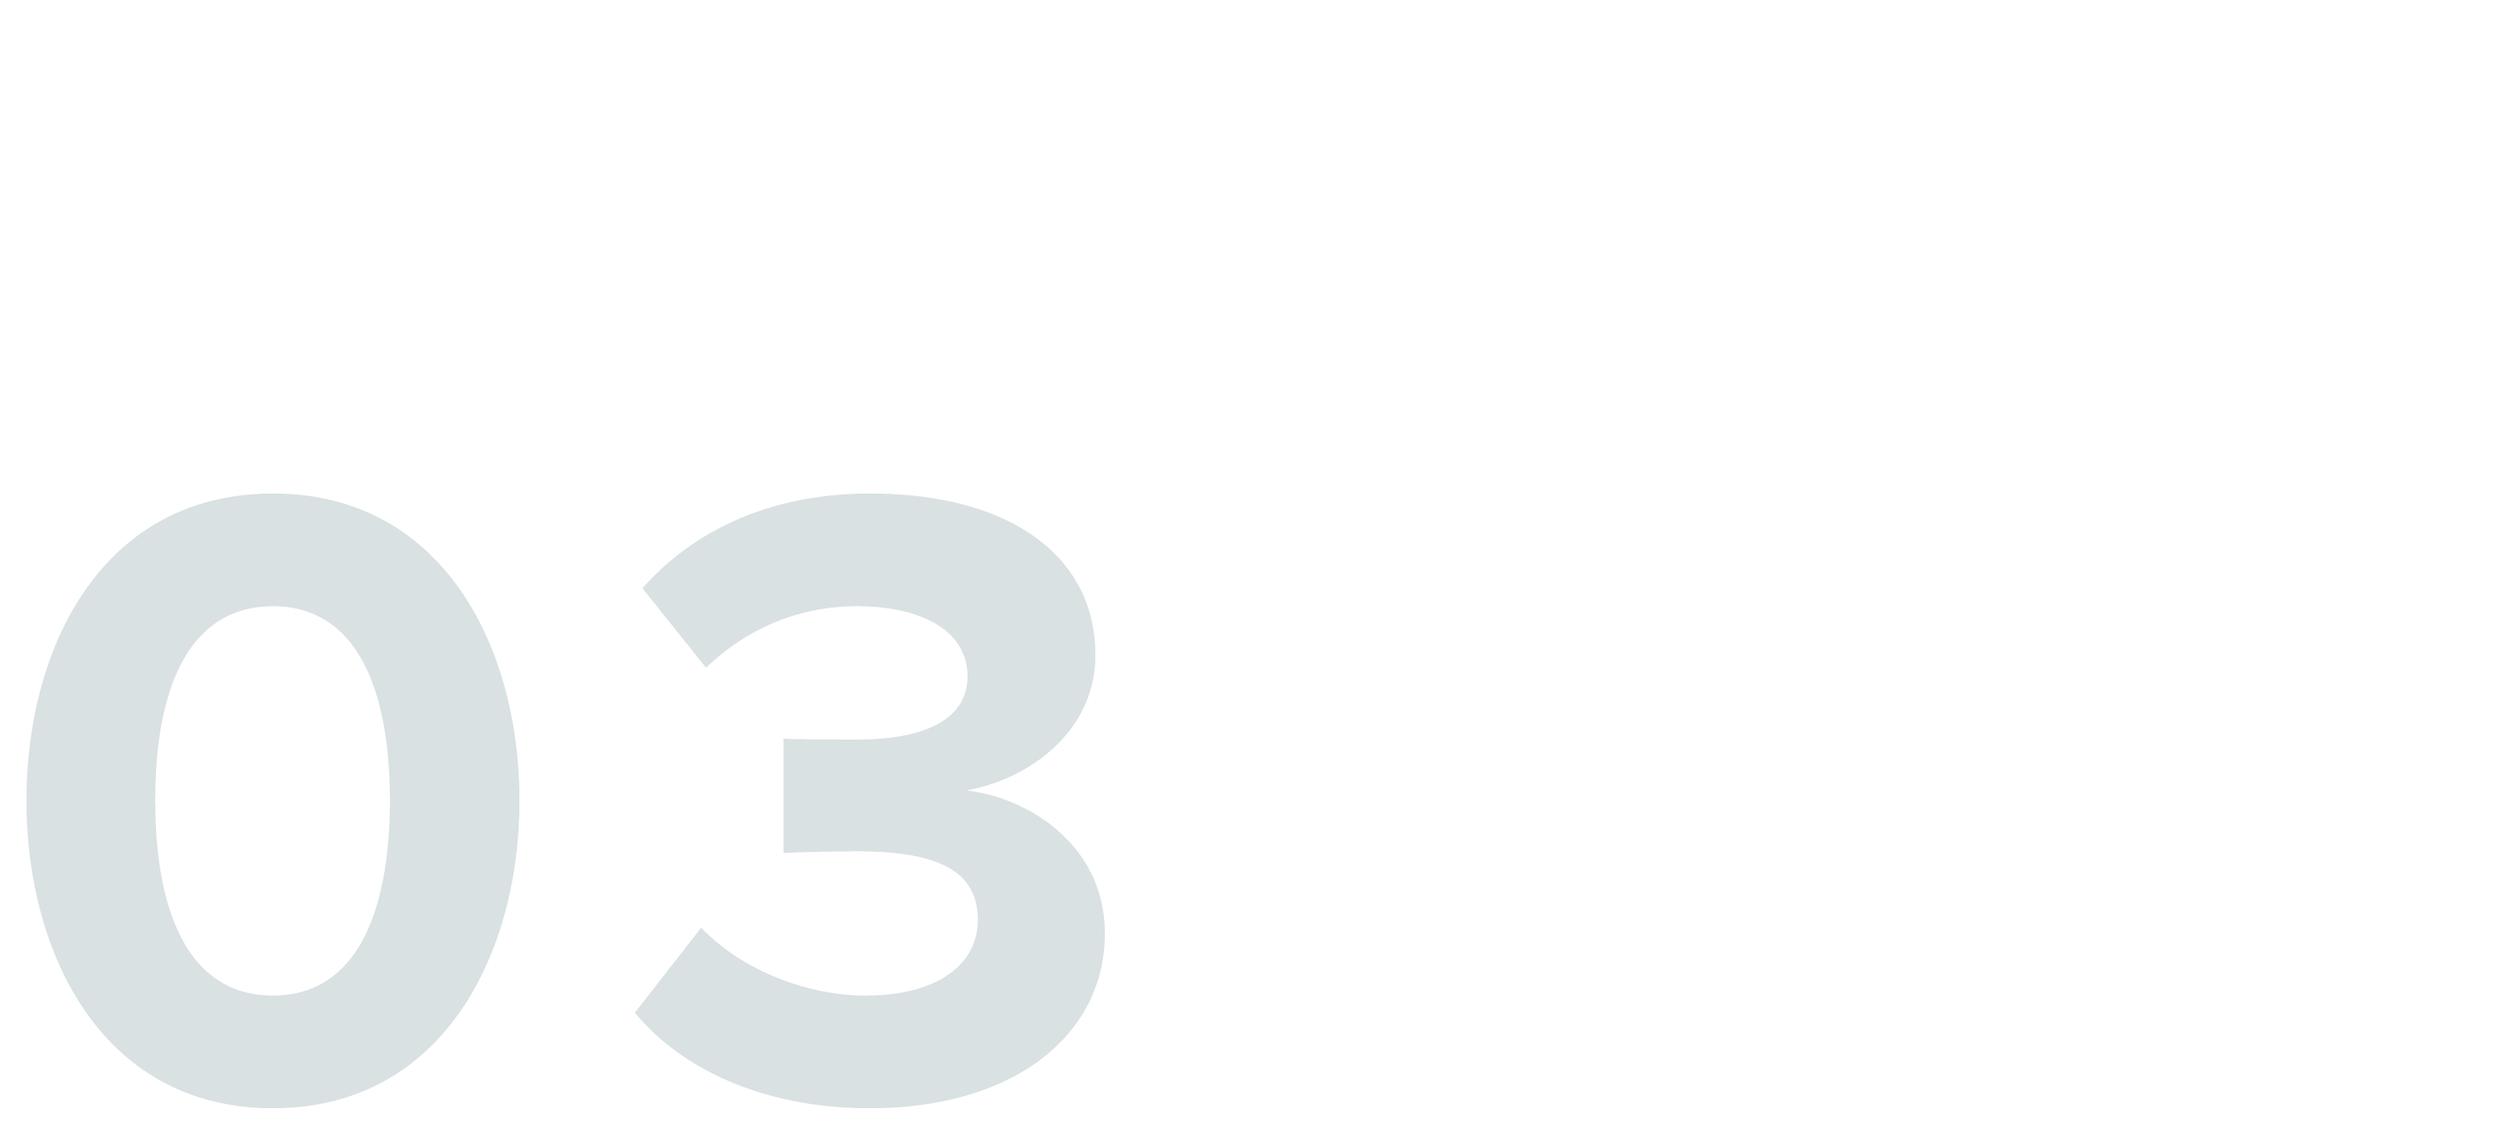 Website Numbers-03.png